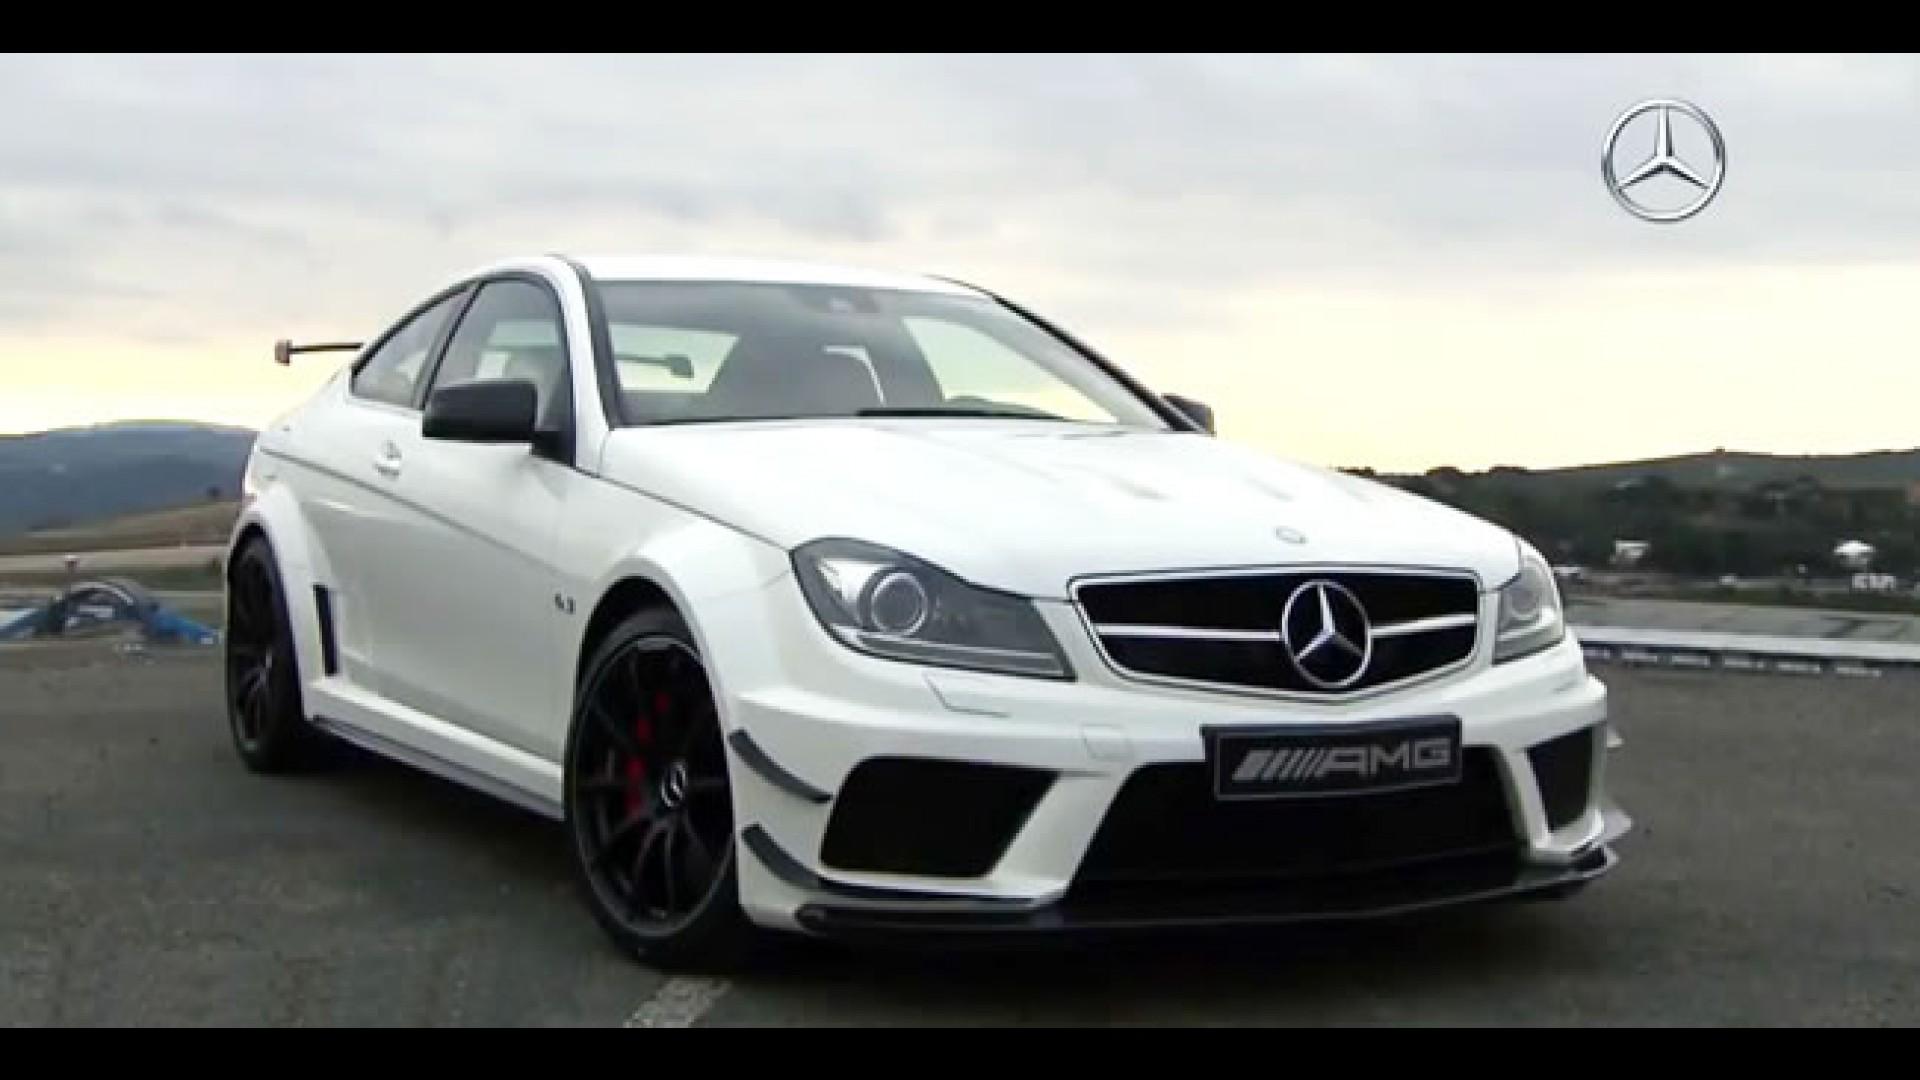 Vídeo: Mercedes Benz C63 AMG Black Series Coupé Product 2011 12 11 08:00:34